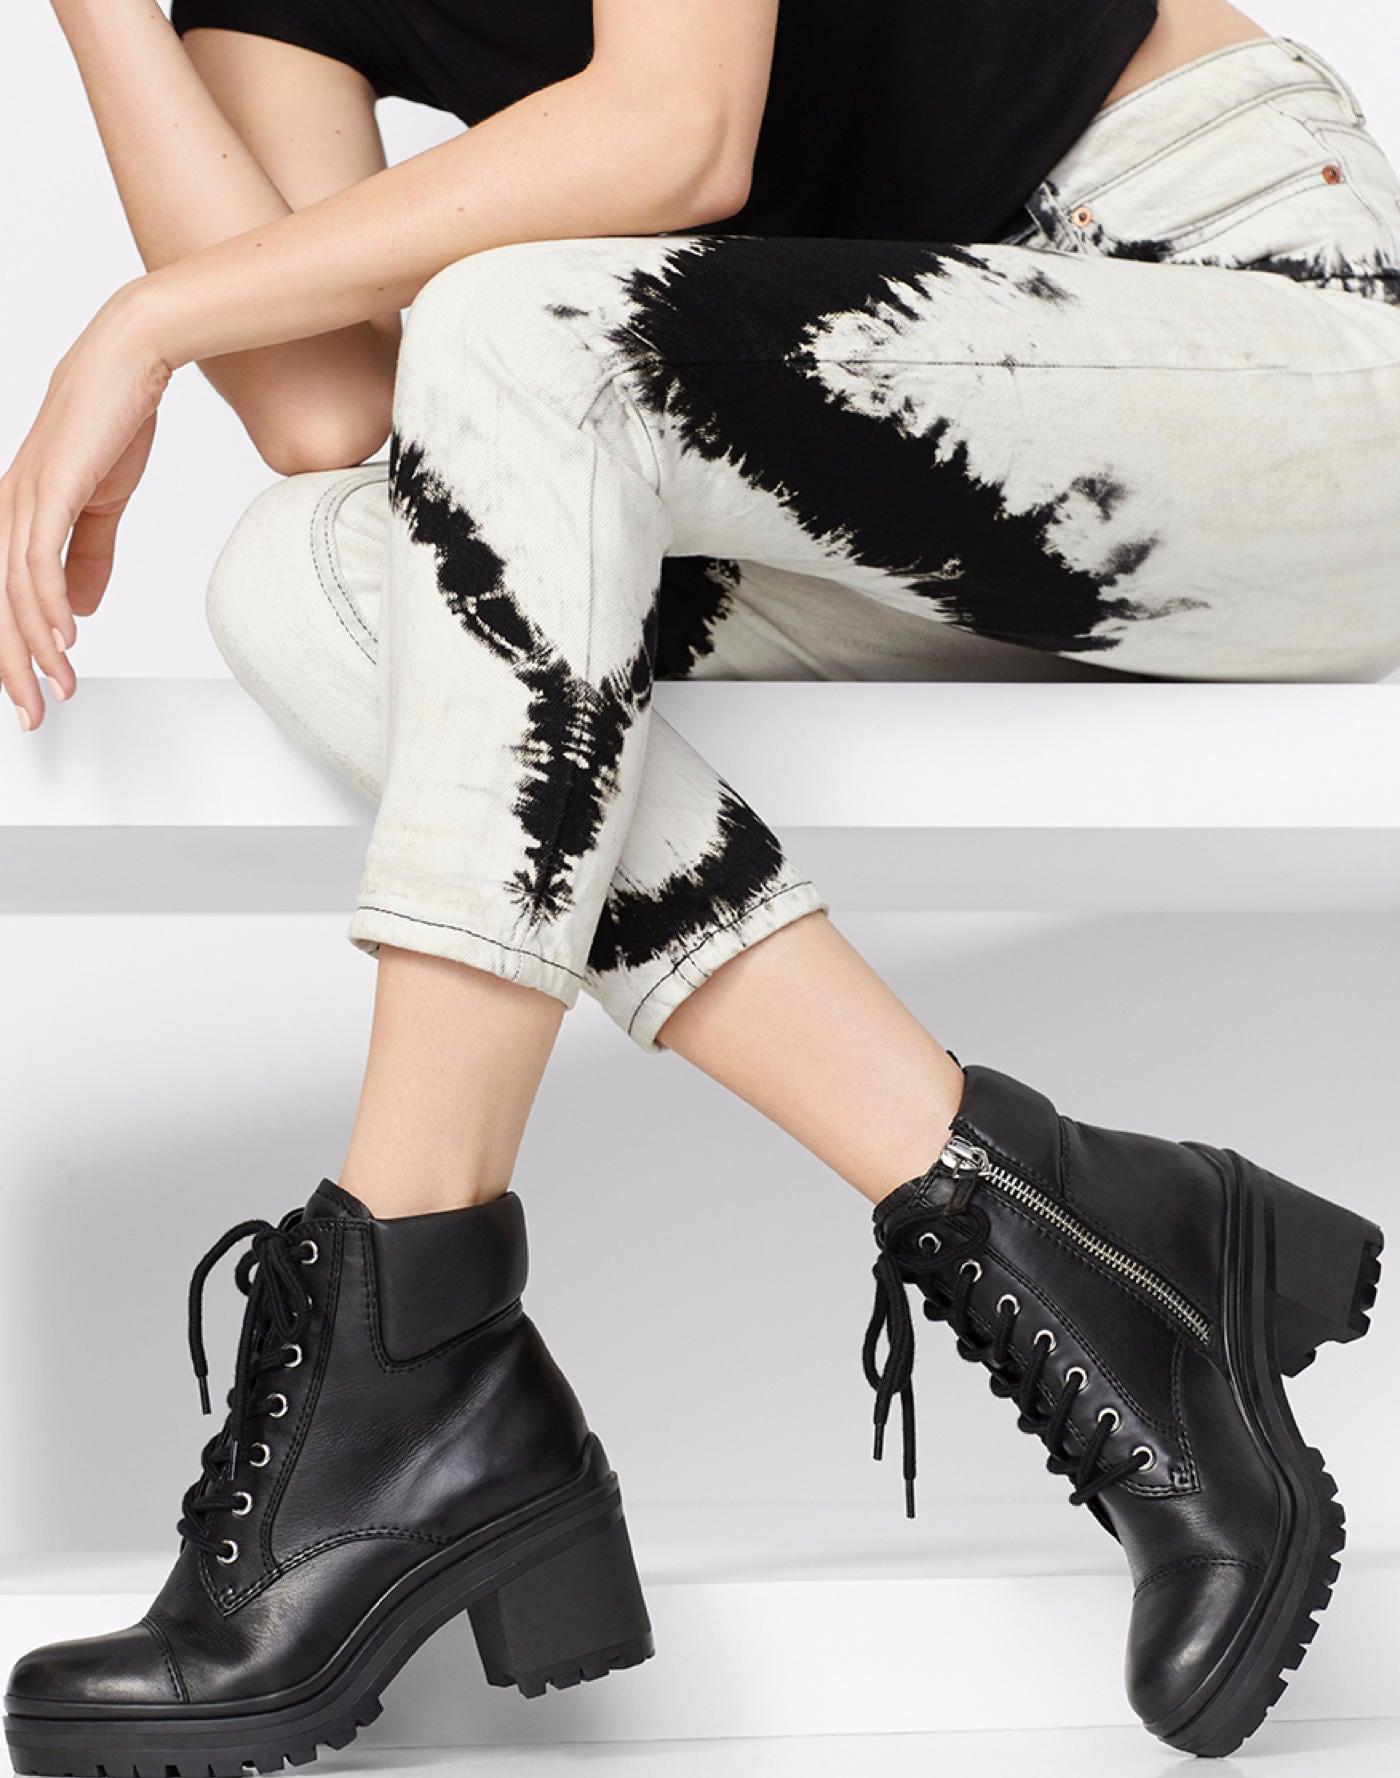 b345a9da6852b Women's Boots | Ankle And Knee-High Ladies' Boots | ALDO UK | ALDO UK